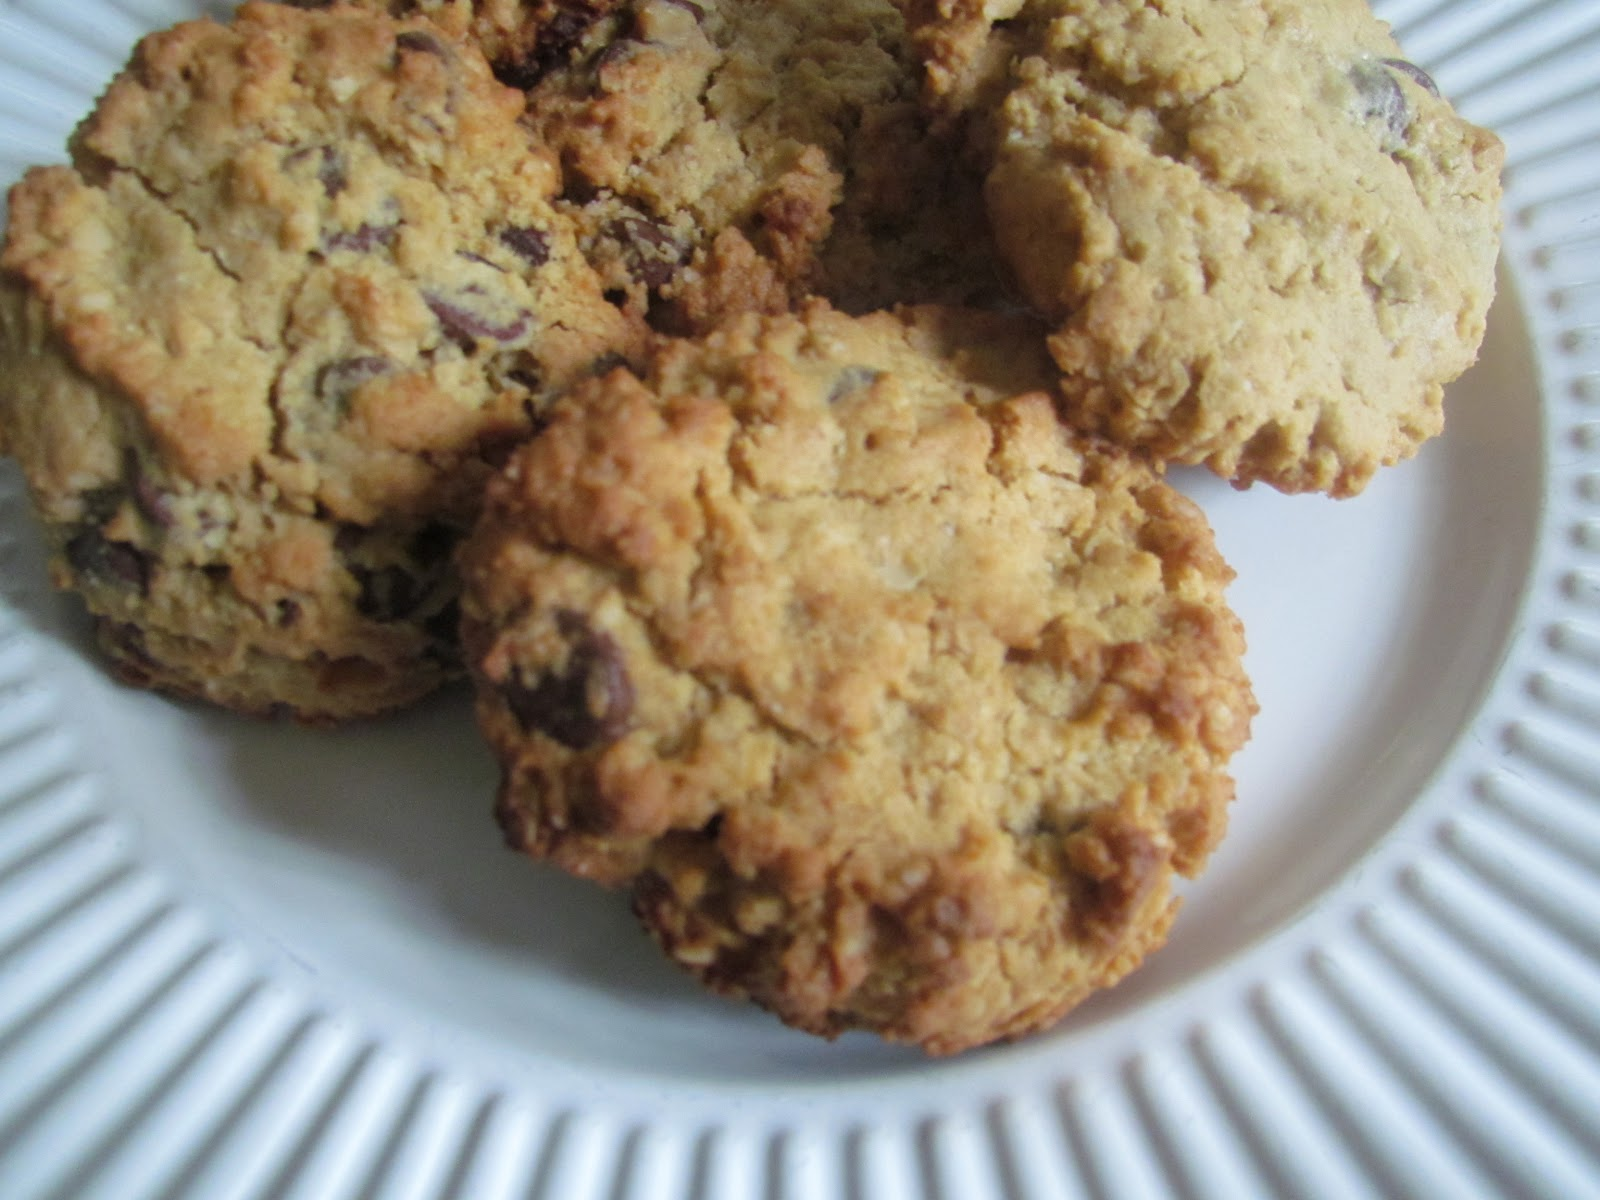 Kraft Peanut Butter Oatmeal Chocolate Chip Cookies